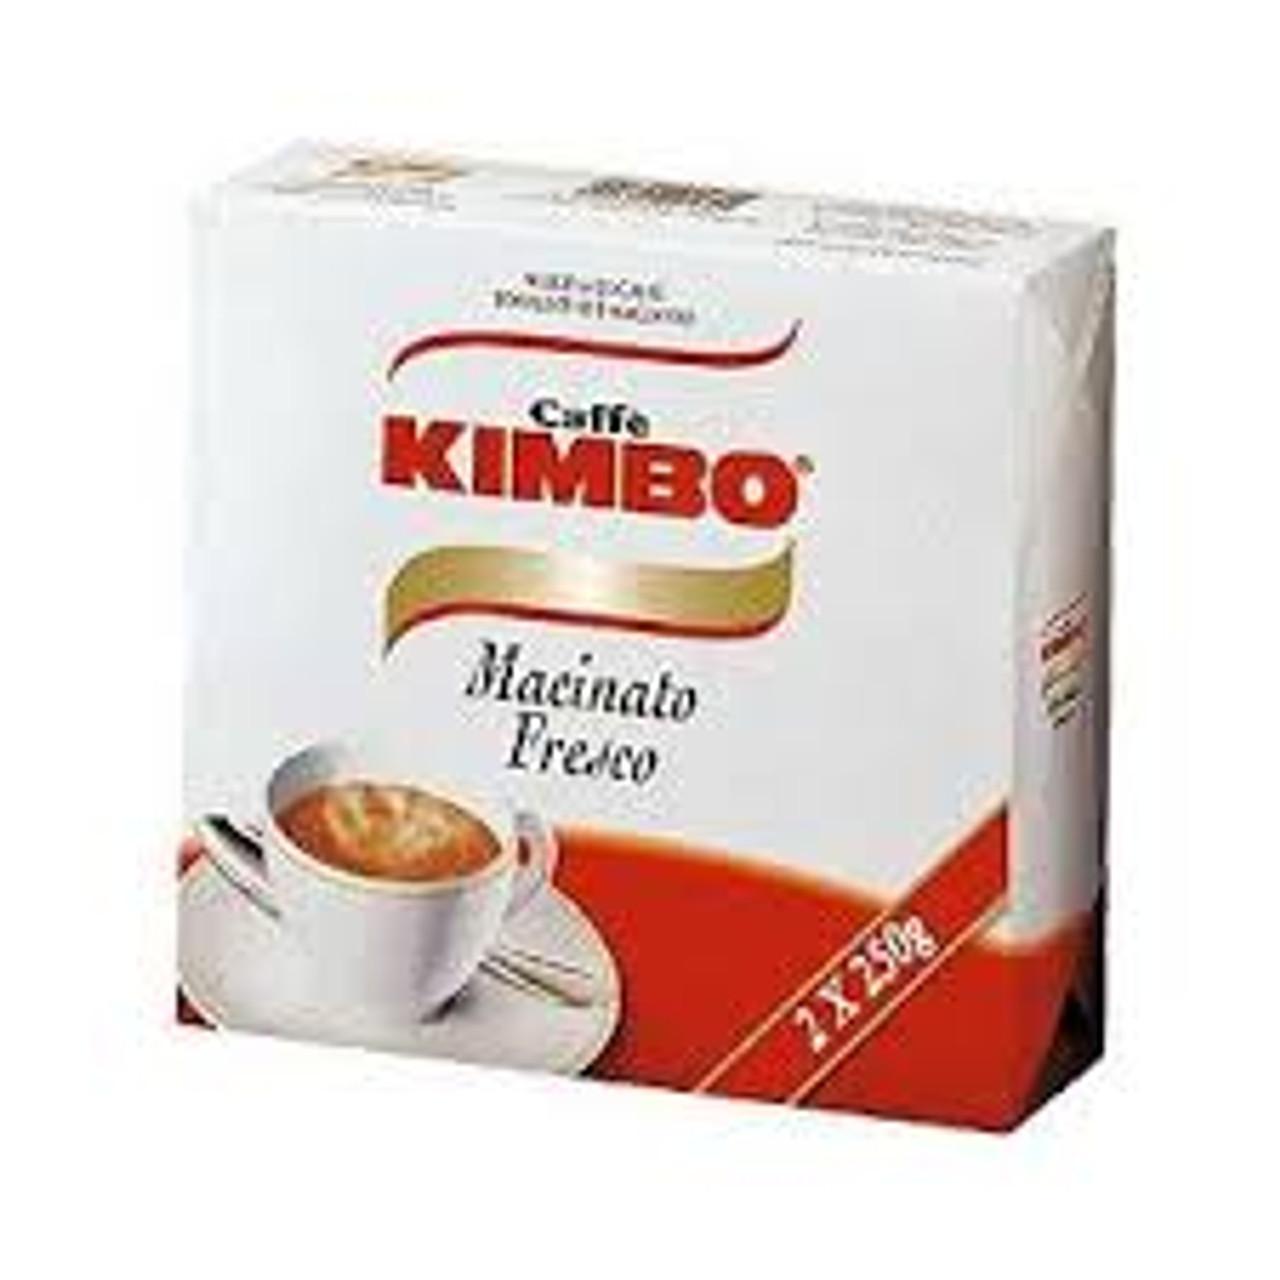 KIMBO Espresso Macinato